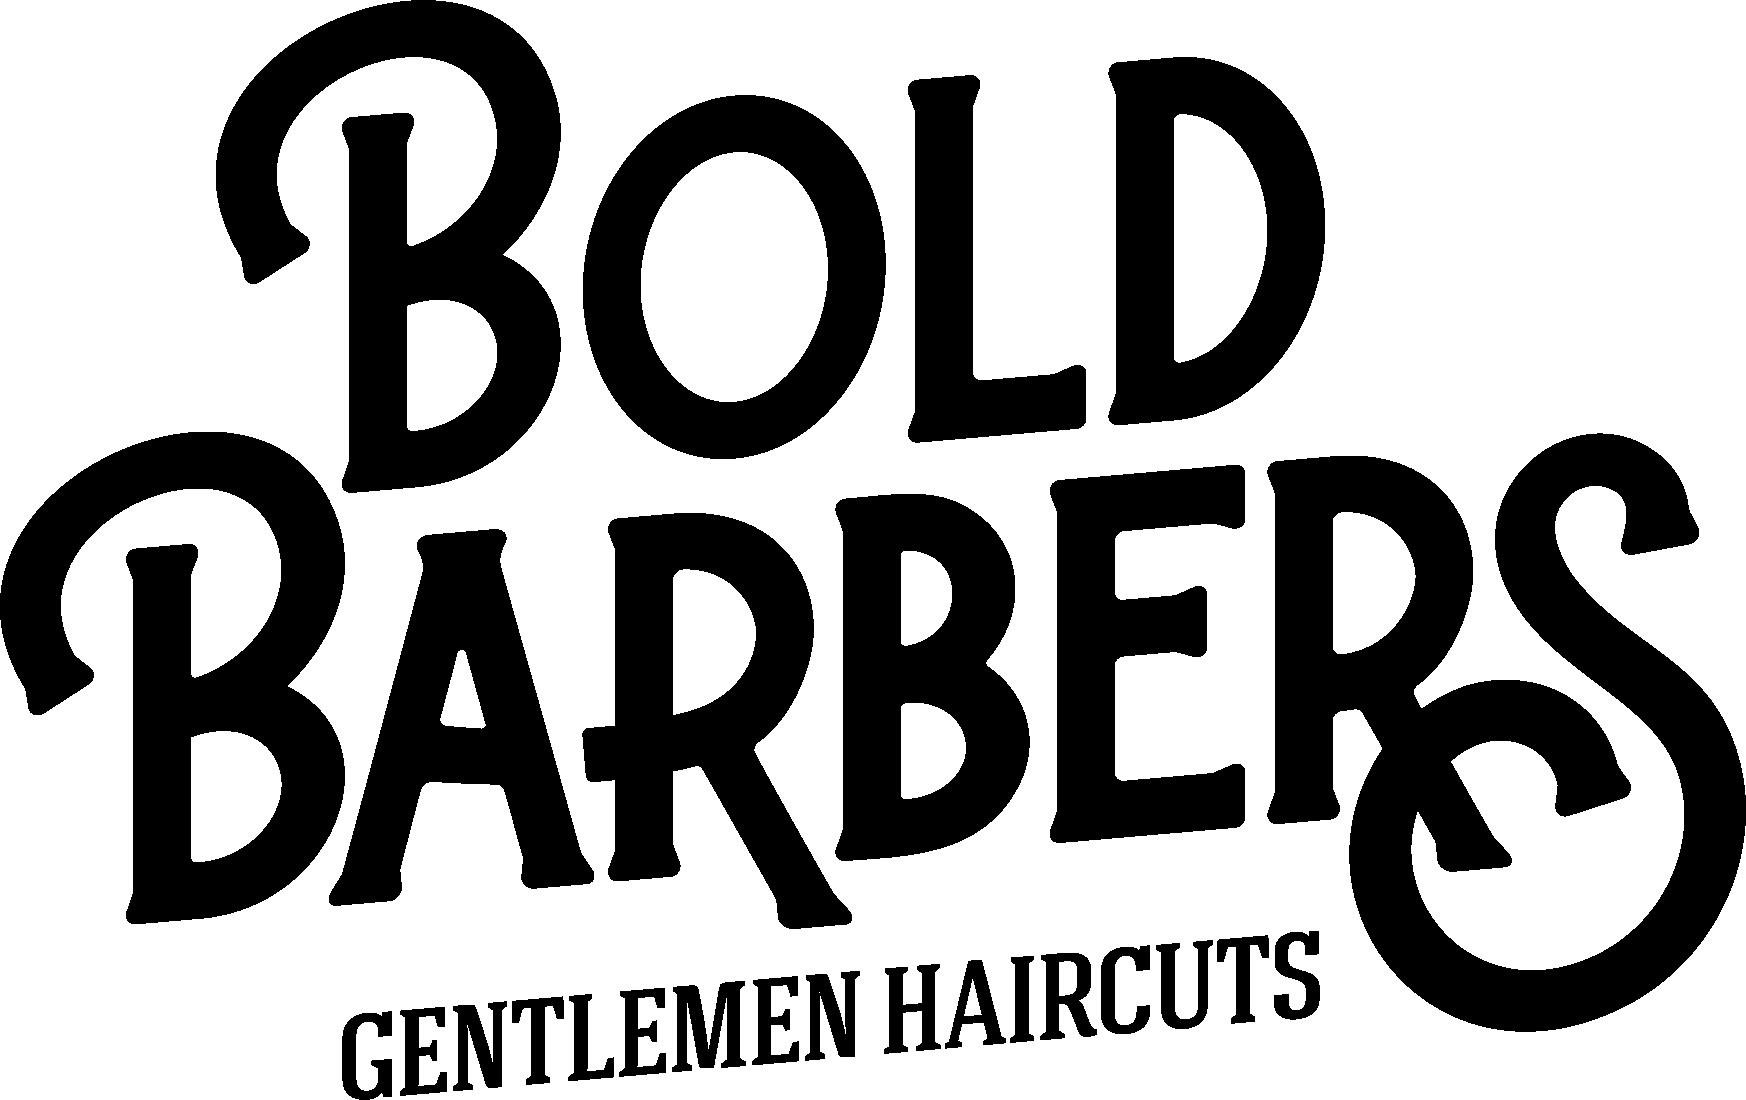 Bold Barbers Logo Kapsalon Veghel